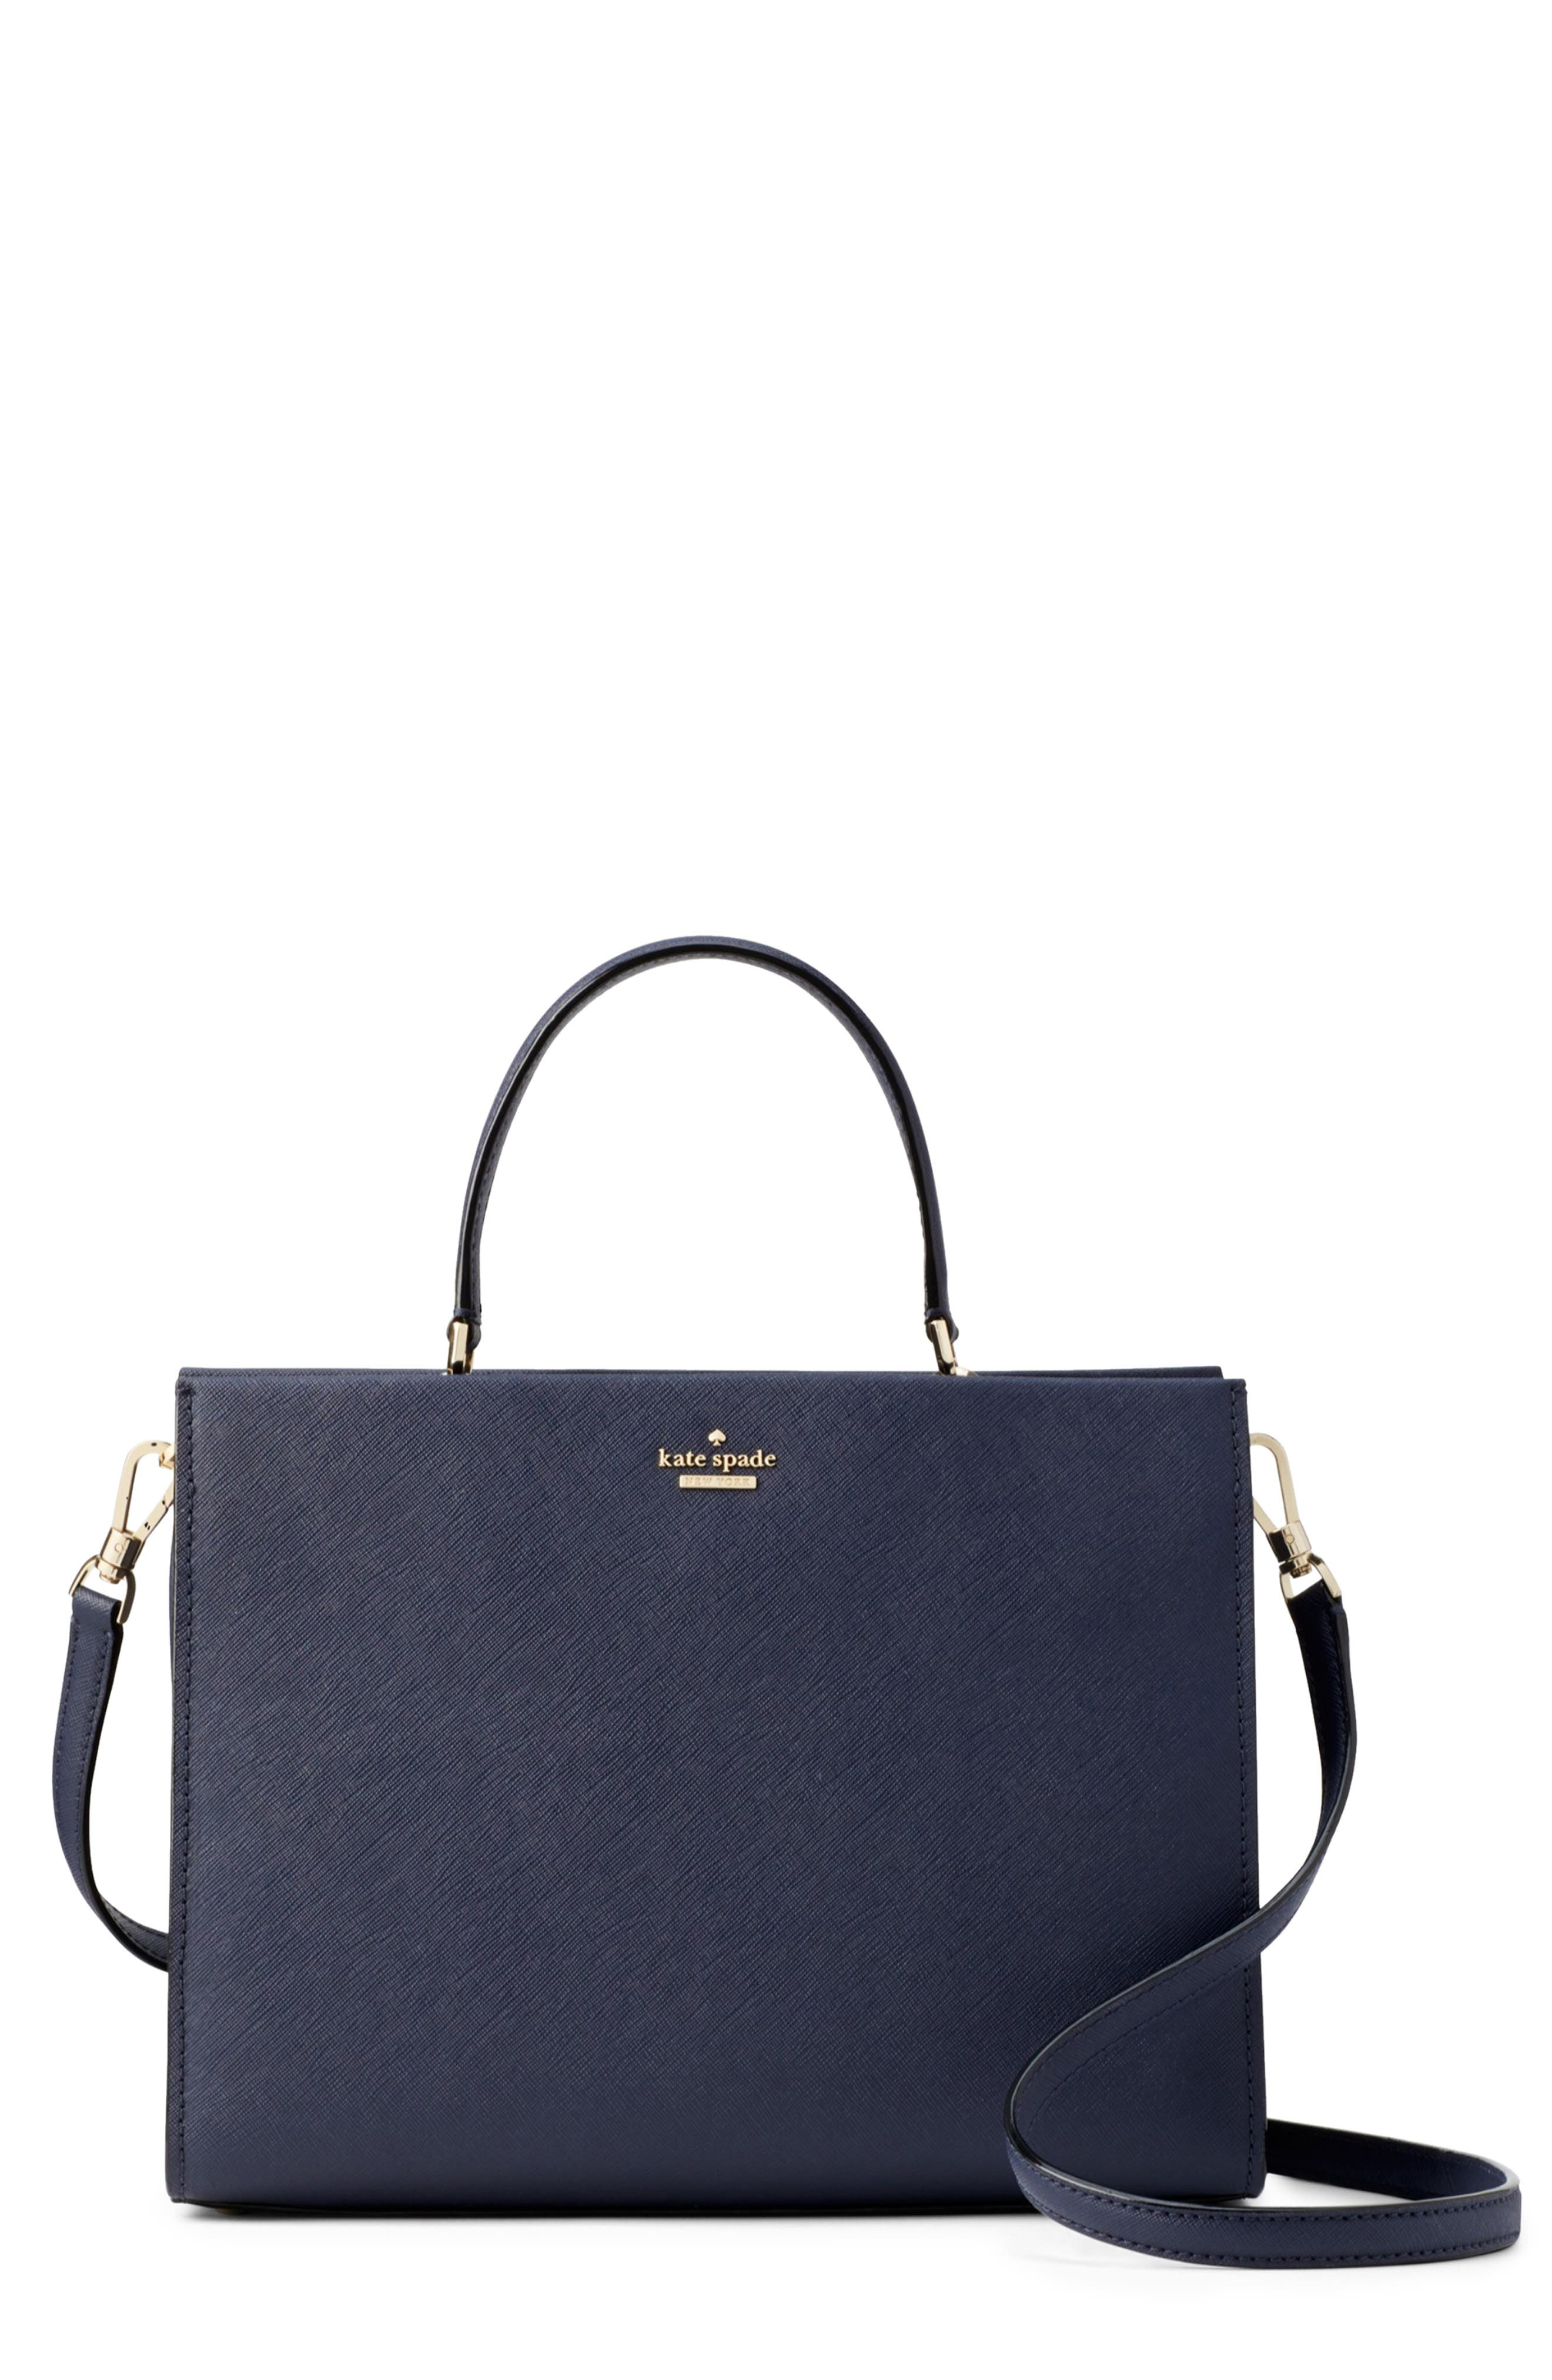 cameron street - sara leather satchel,                         Main,                         color, BLAZER BLUE